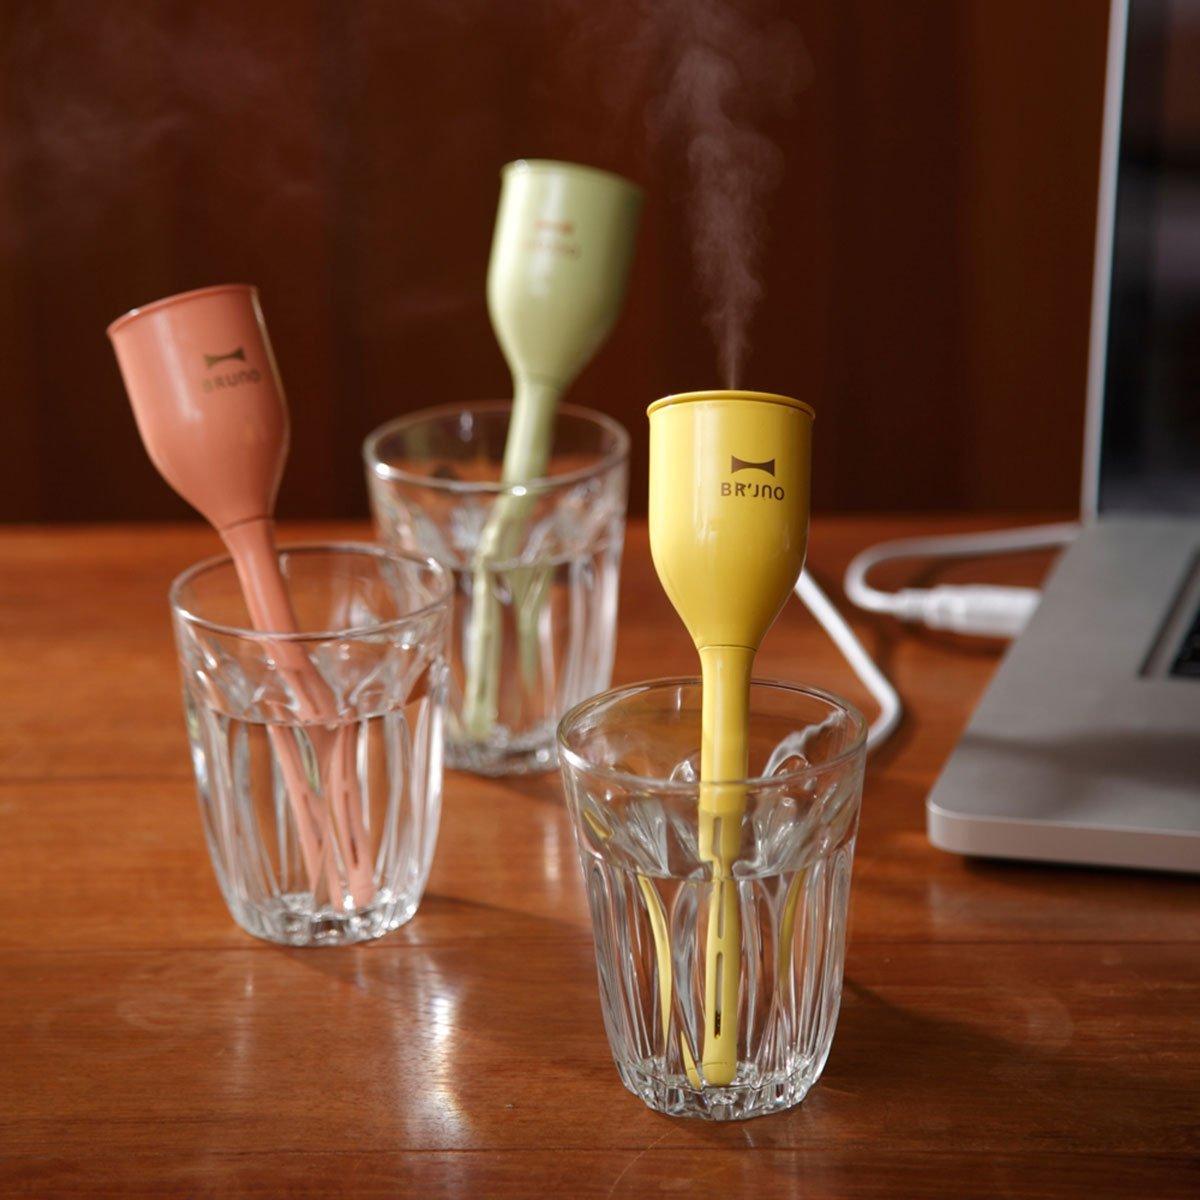 Tulip Stick Ultrasonic Humidifier